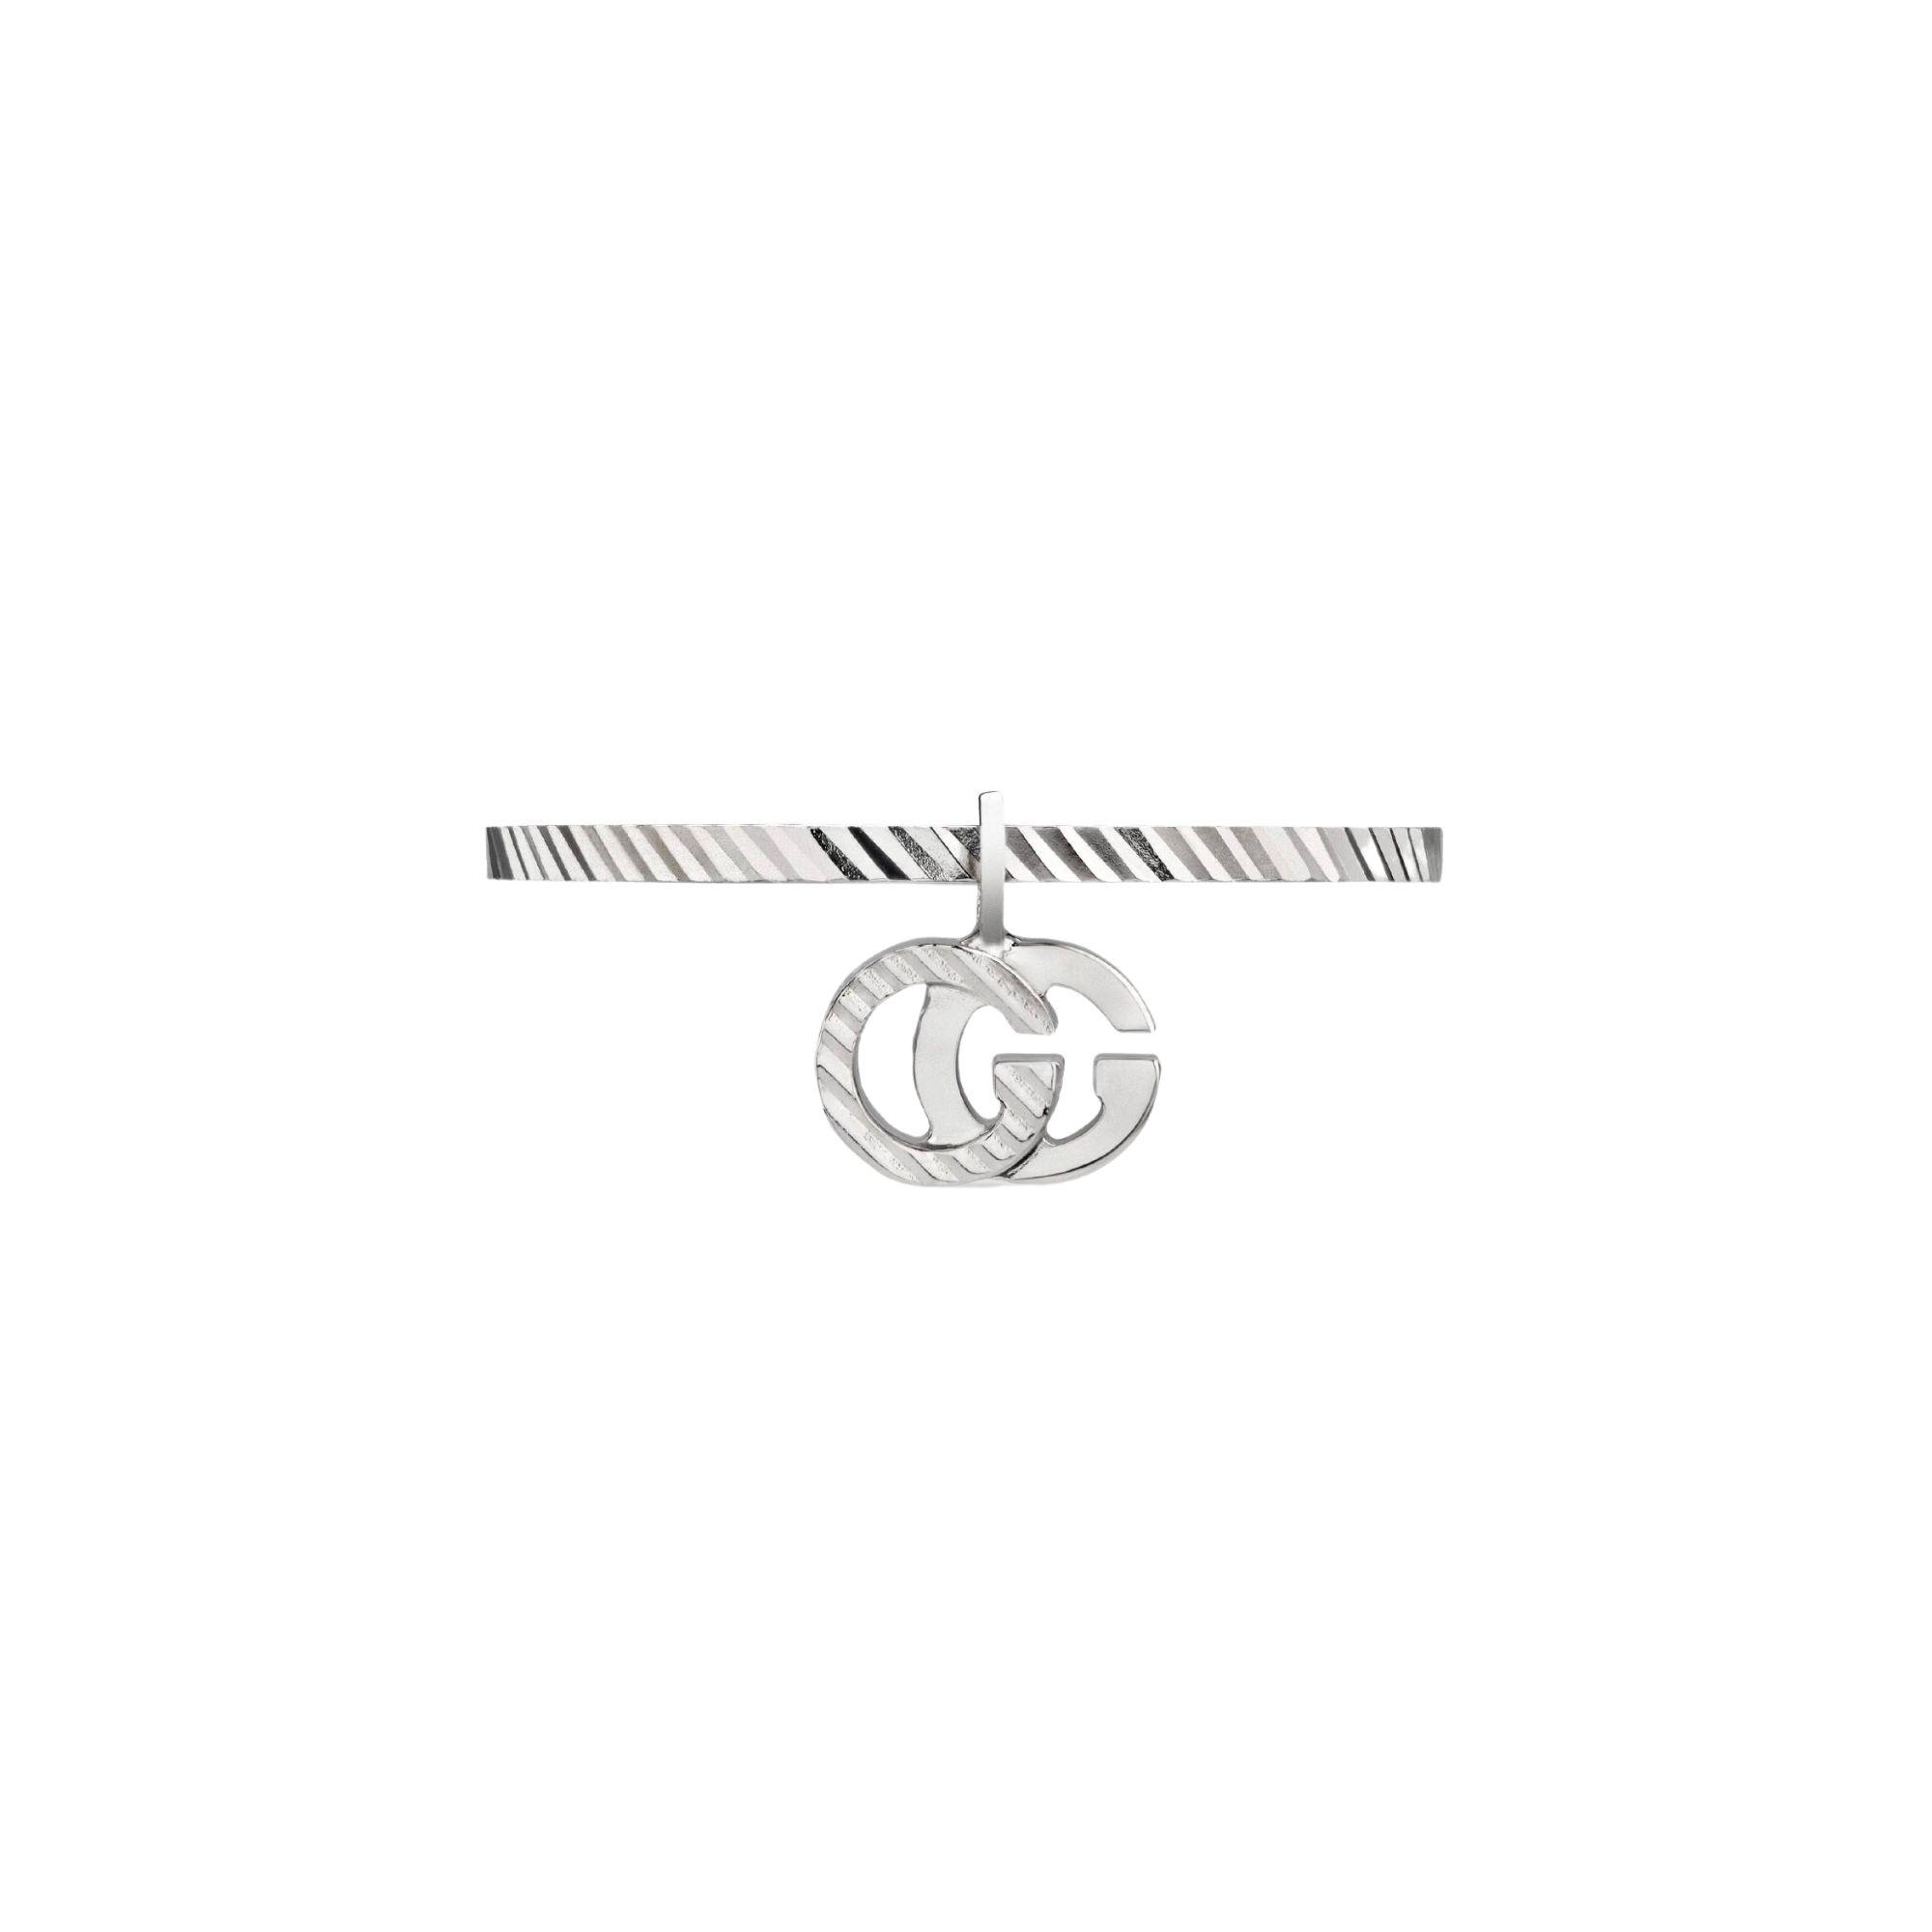 648599_J8502_9000_004_100_0000_Light-Anello-GG-Running-18carati Gucci ring sconto discount